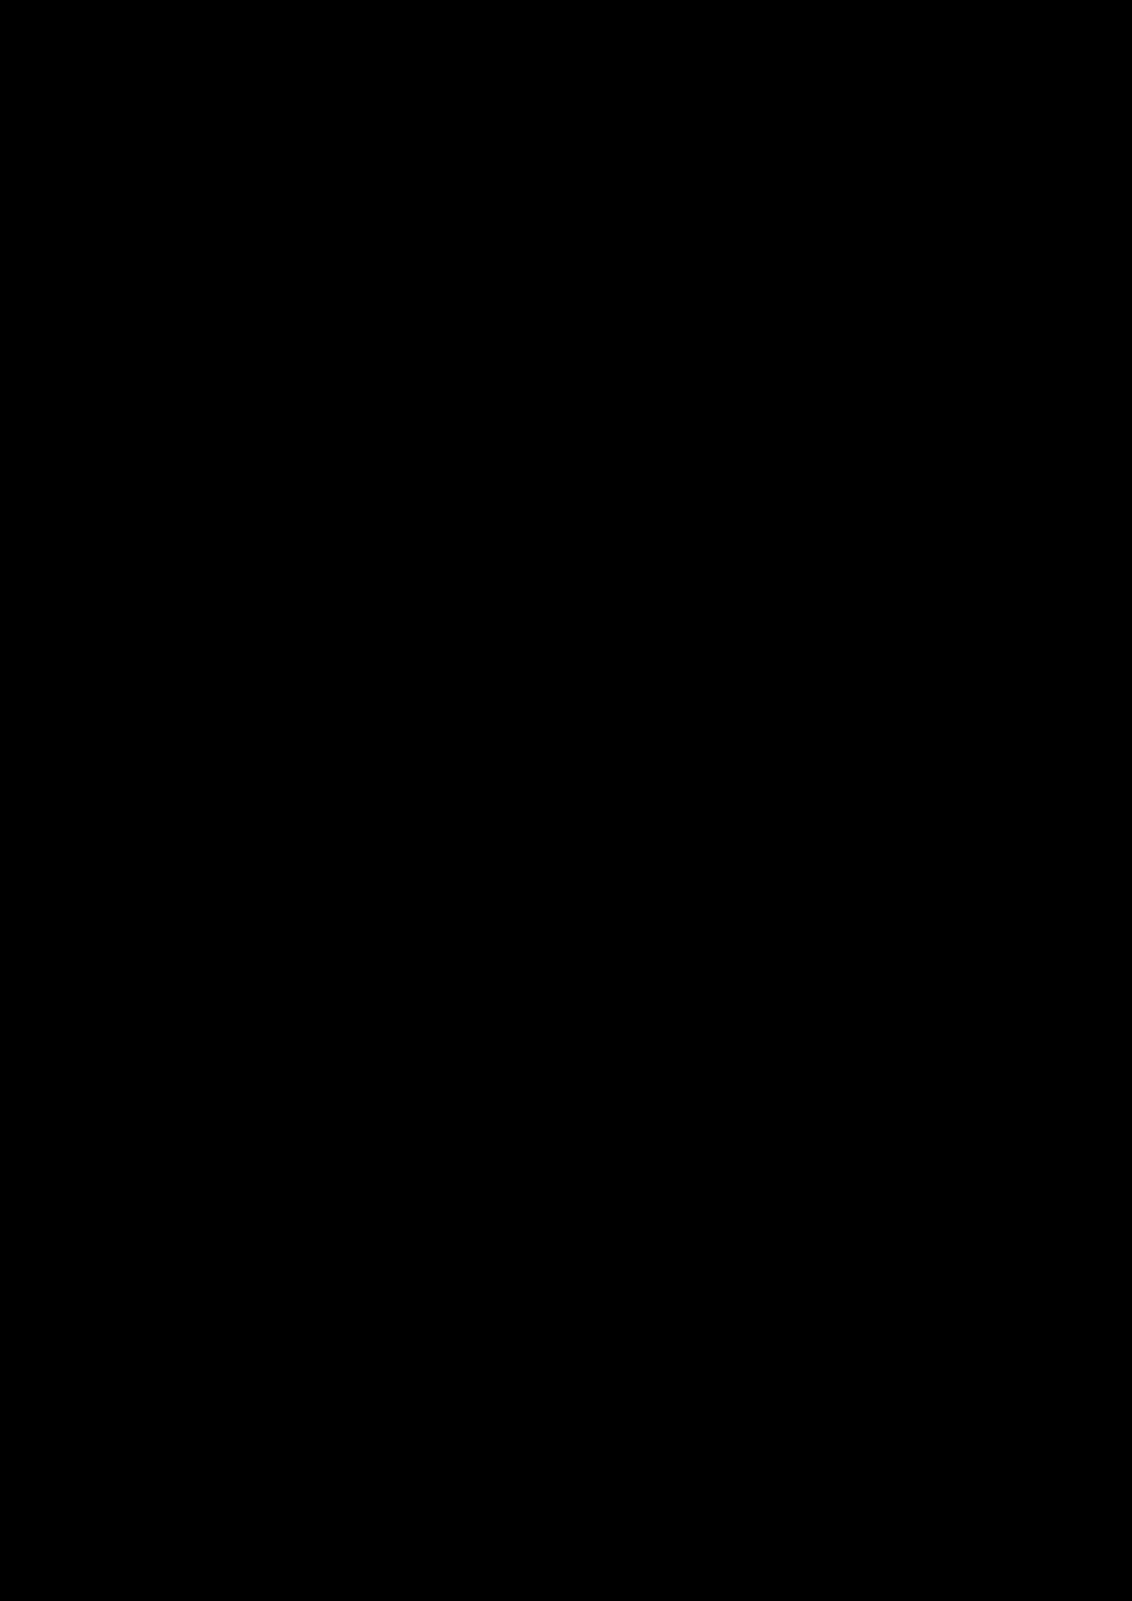 18 berez slide, Image 18